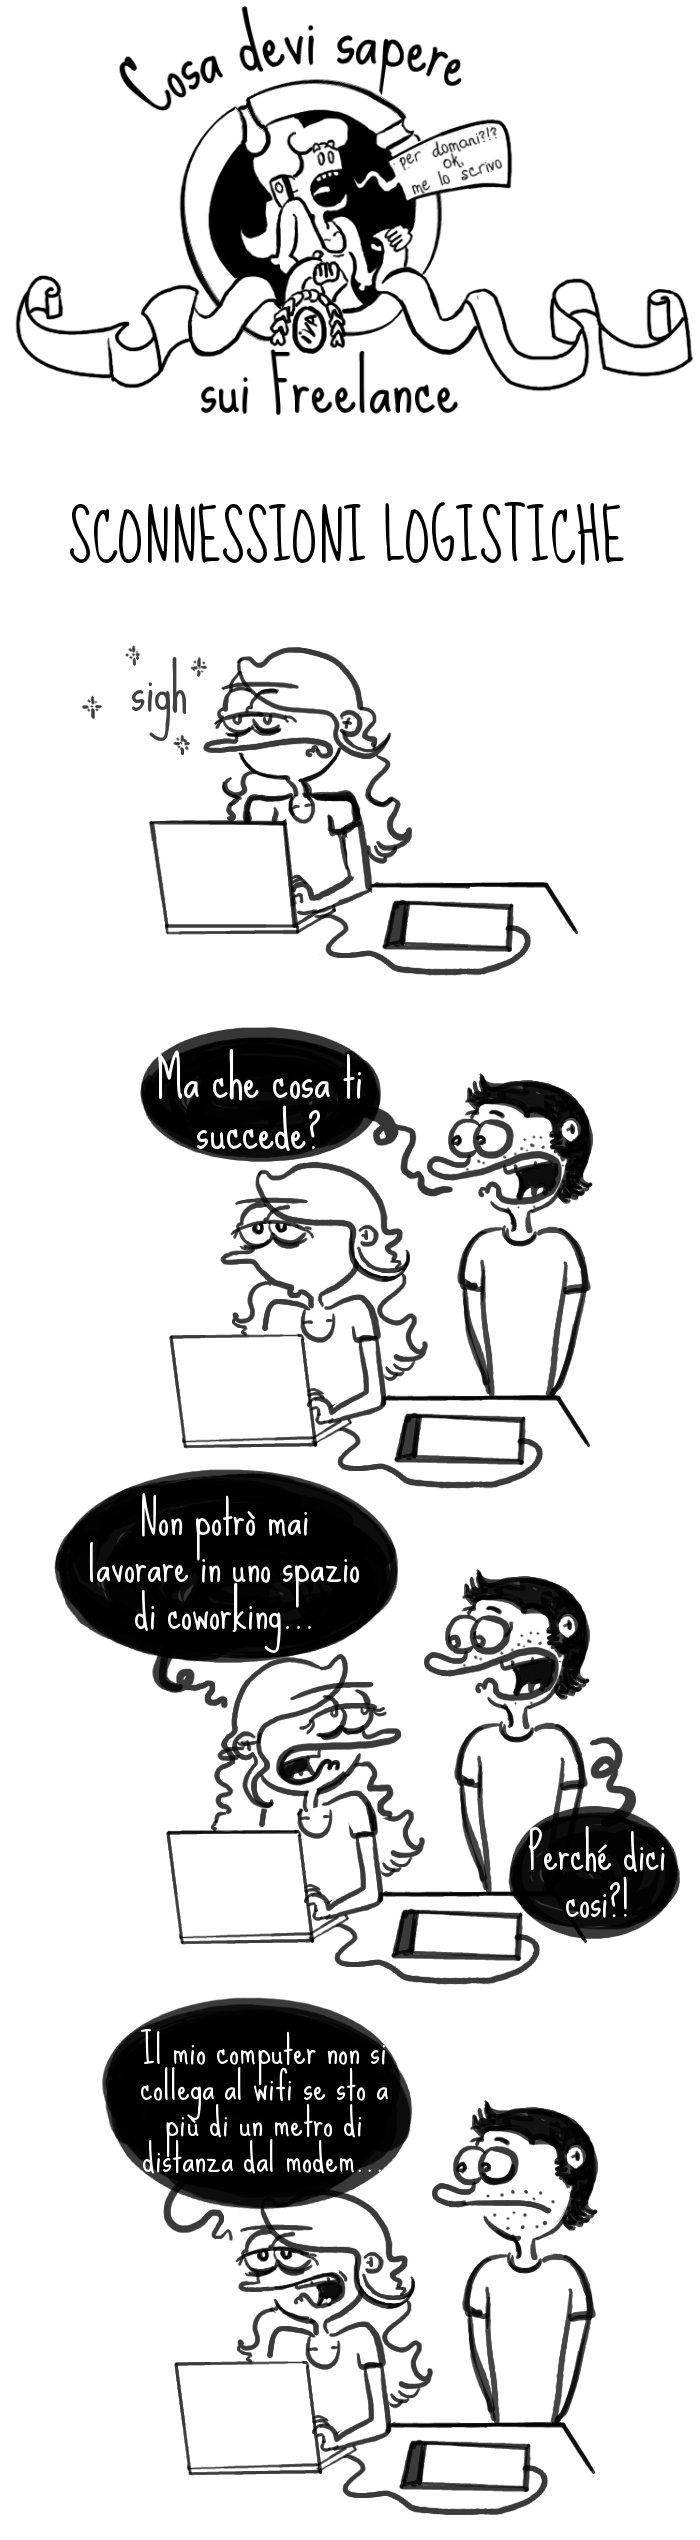 freelance-it